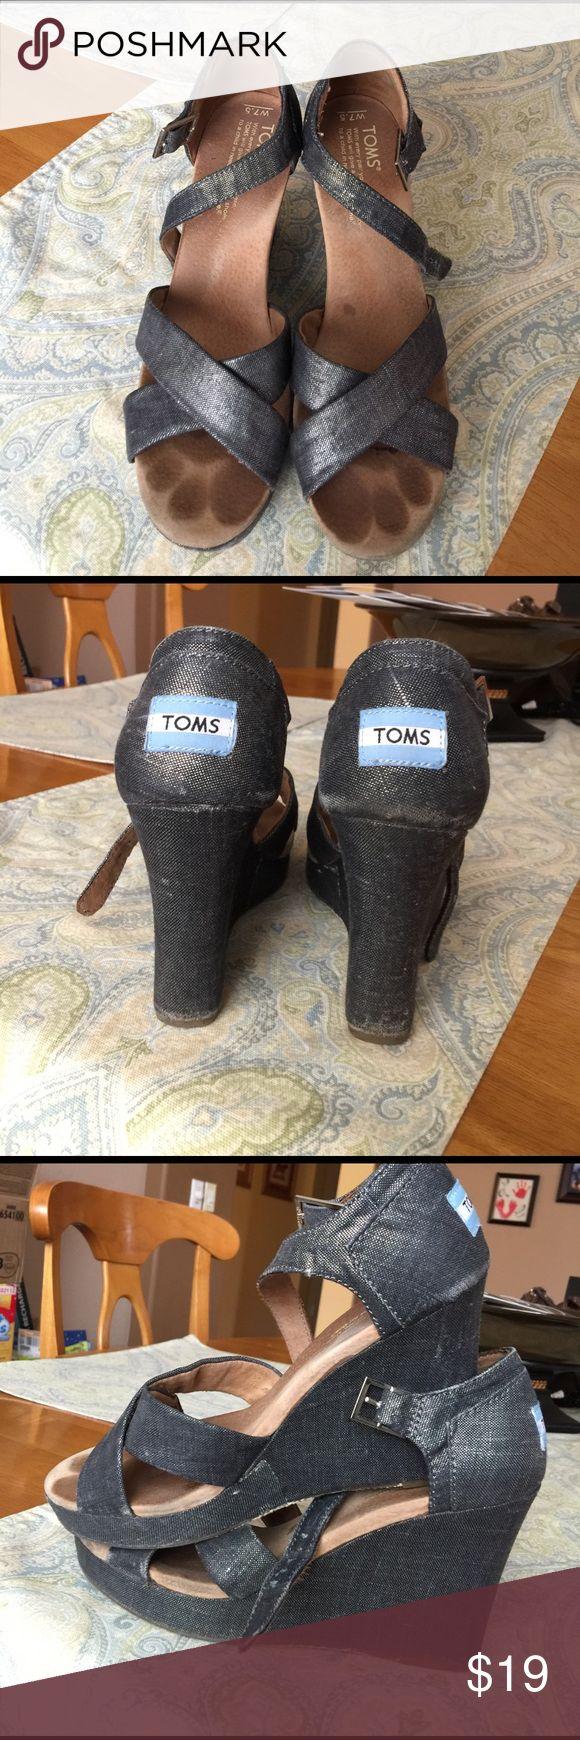 Toms grey metallic wedges. Size 7.5 Toms grey metallic wedges size 7.5. TOMS Shoes Wedges